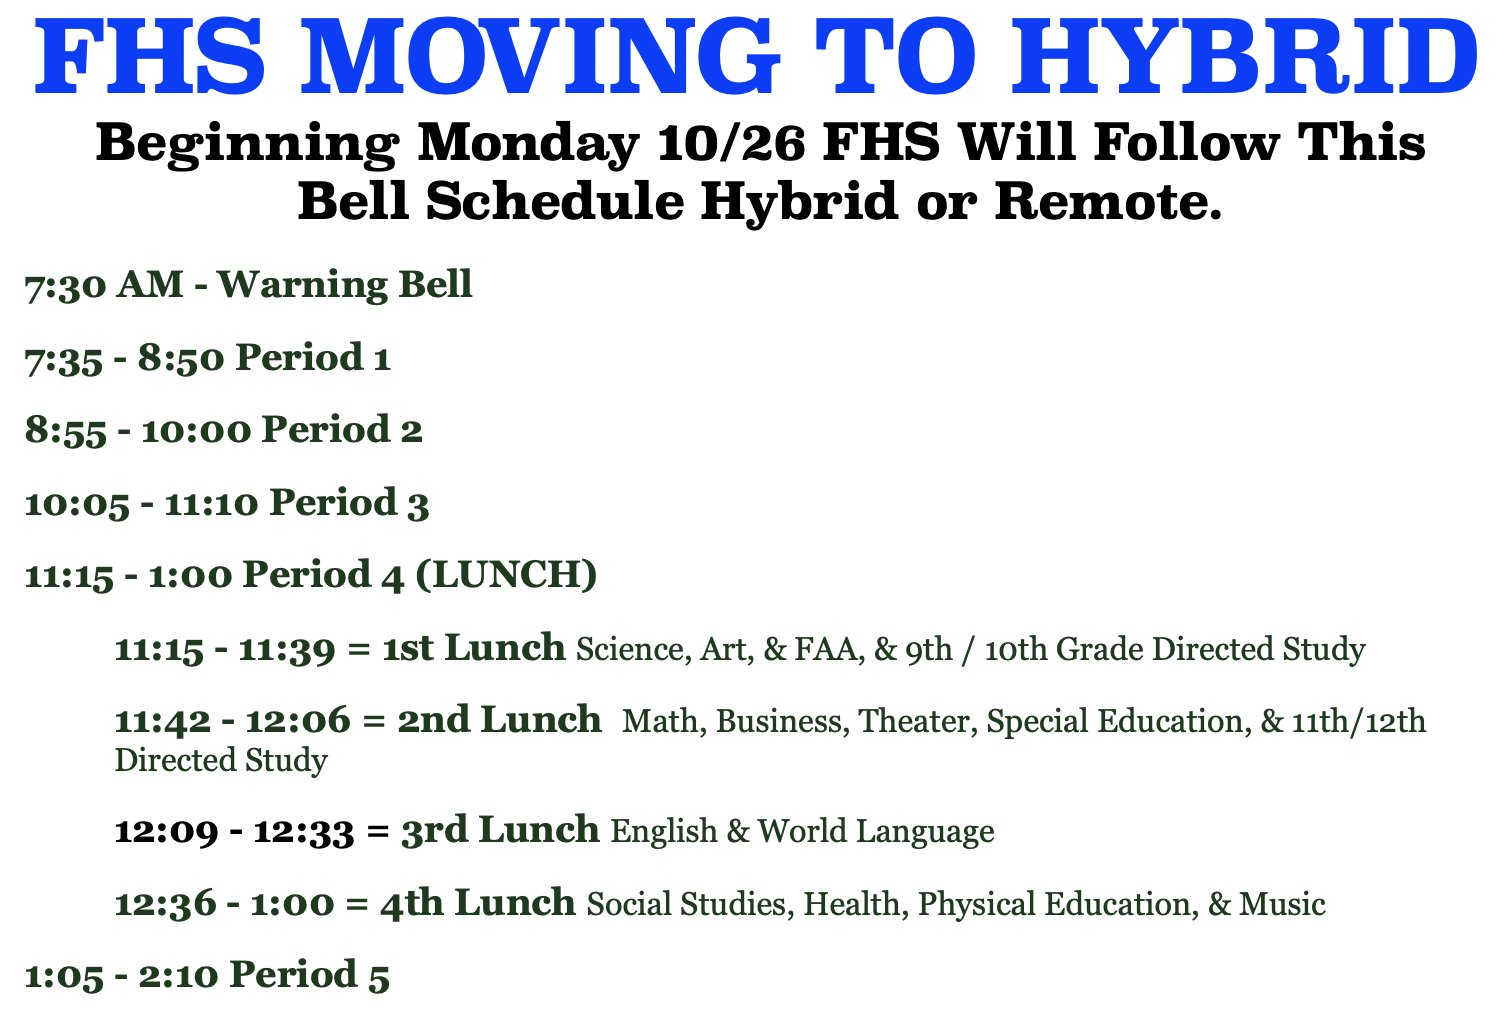 FHS hybrid bell schedule